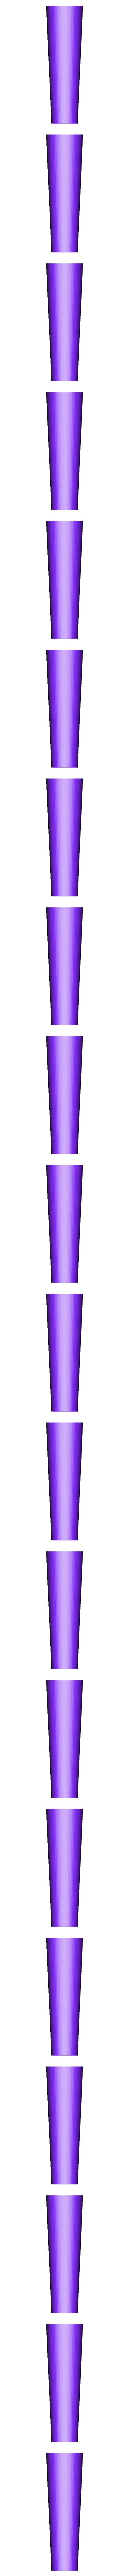 Thumper_body_1.stl Download free STL file Dune Thumper - working • 3D printing design, poblocki1982